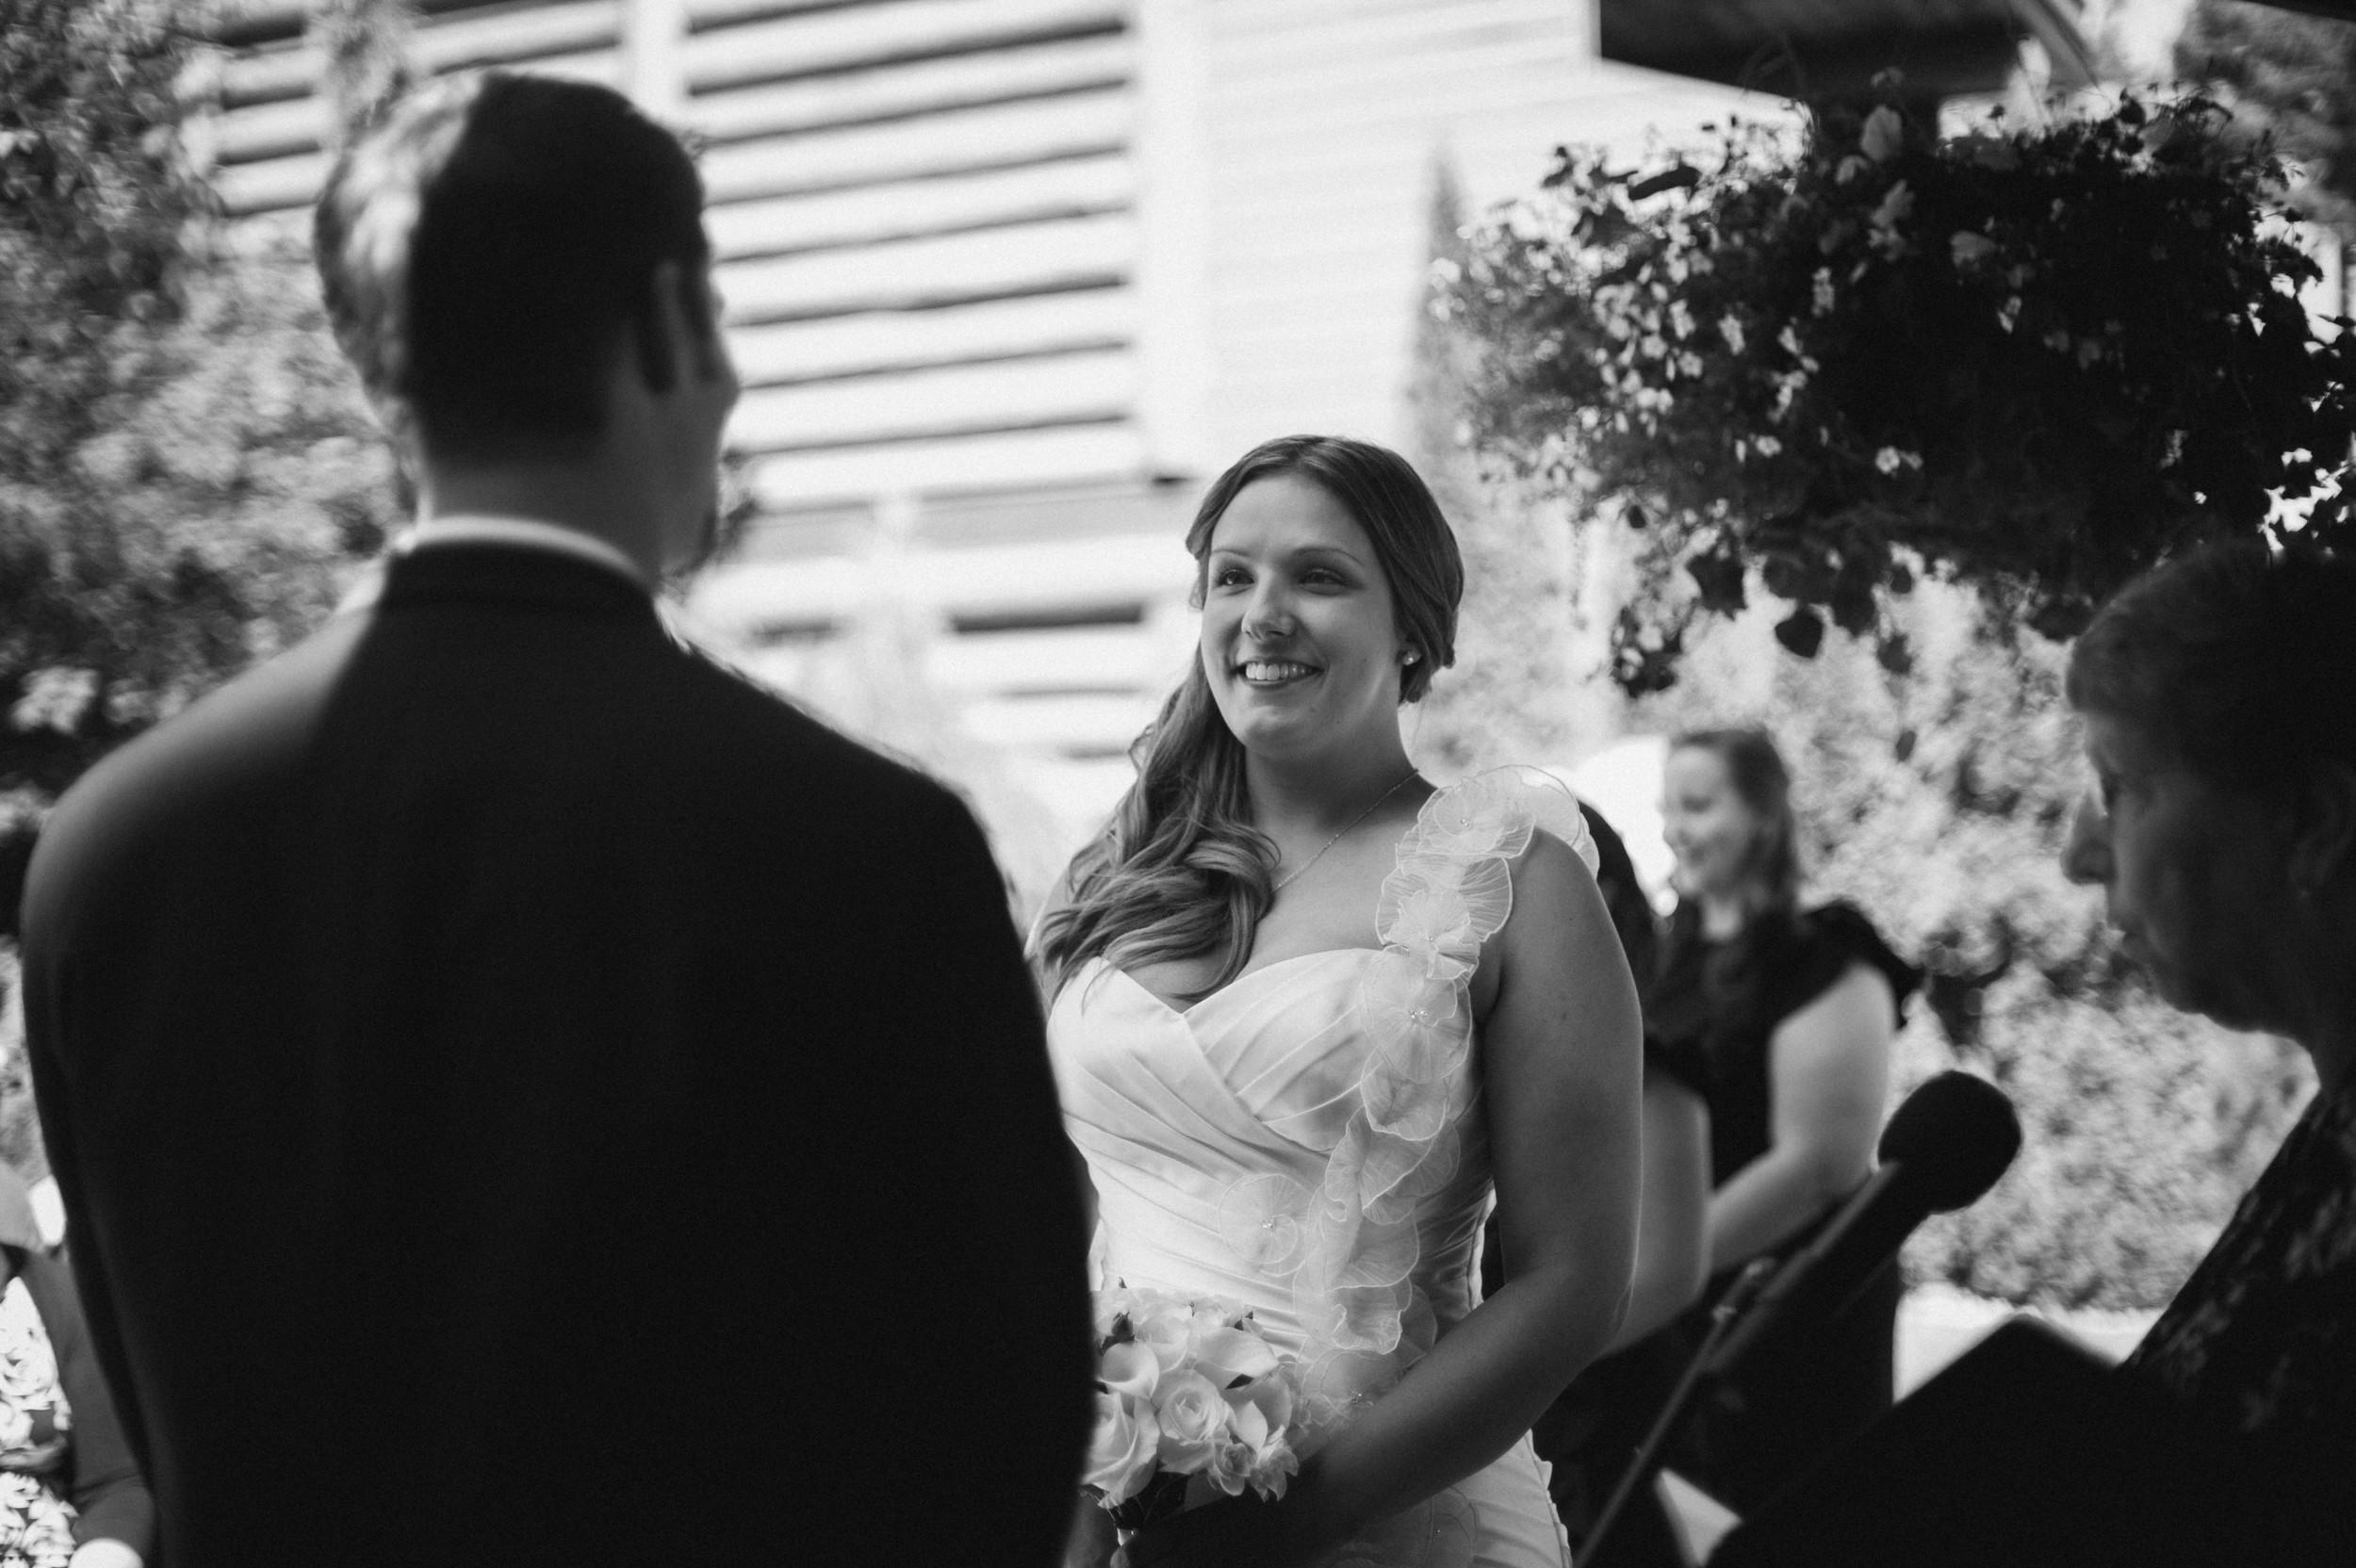 Victoria Parksville wedding photographer edward lai photography